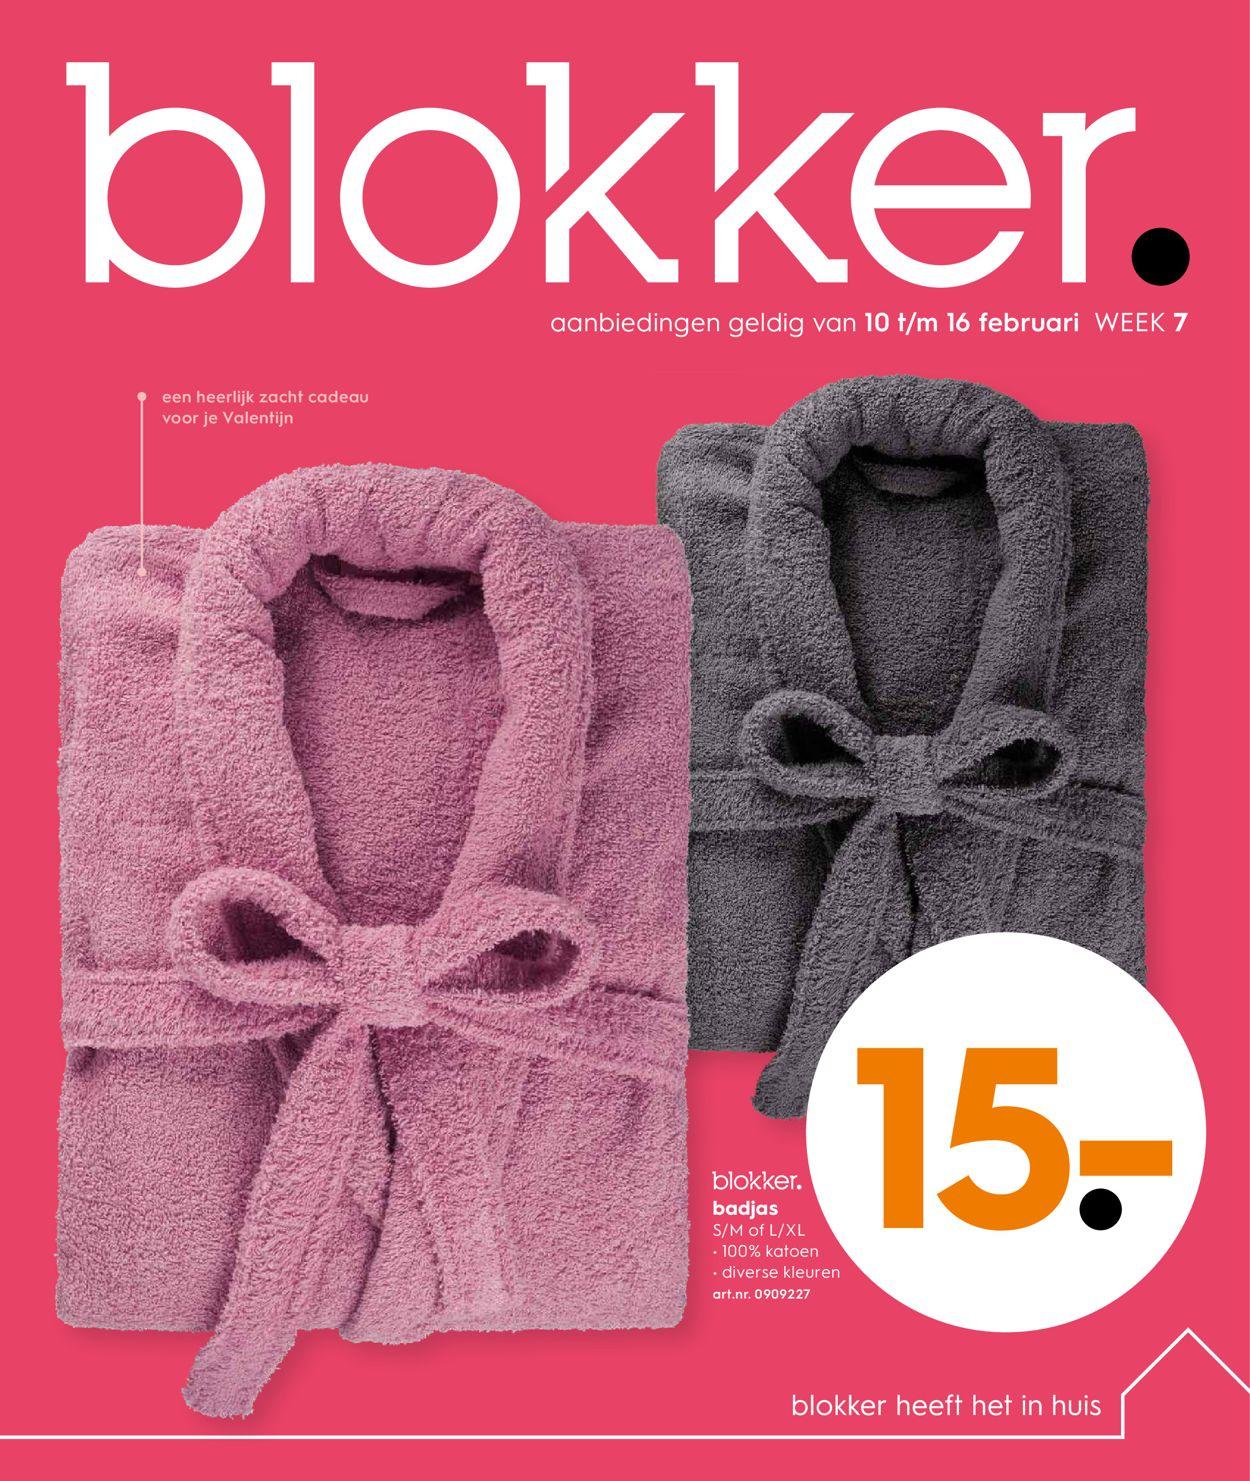 Blokker Folder - 10.02-16.02.2020